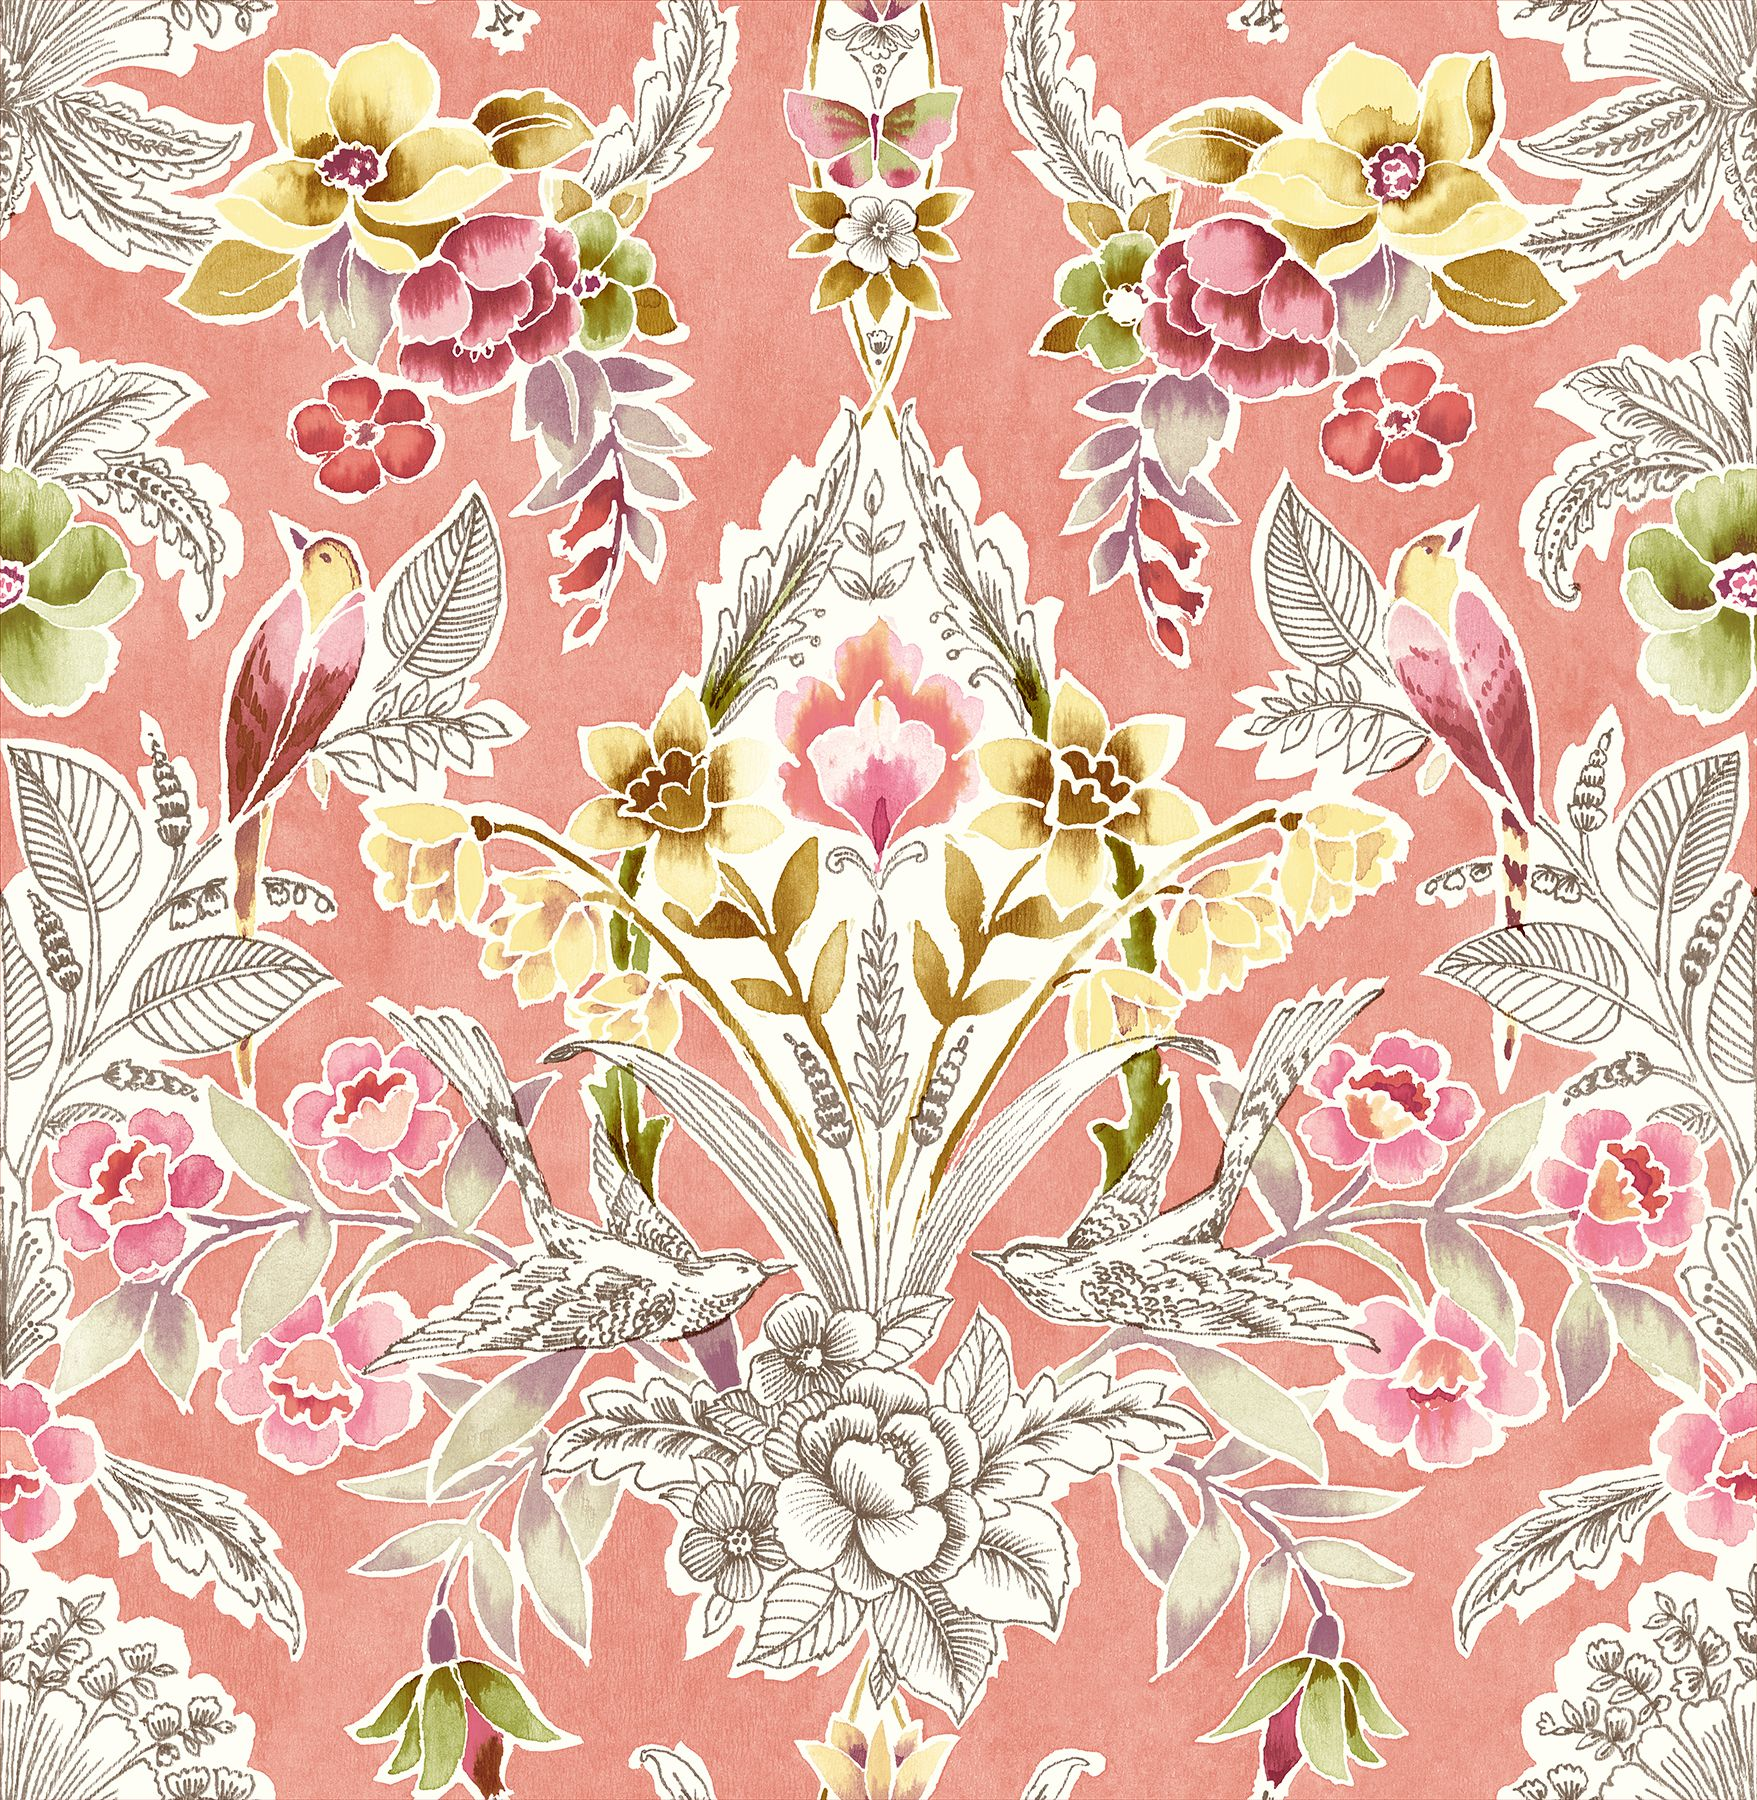 Vera Pink Floral Damask Wallpaper Brewster wallpaper